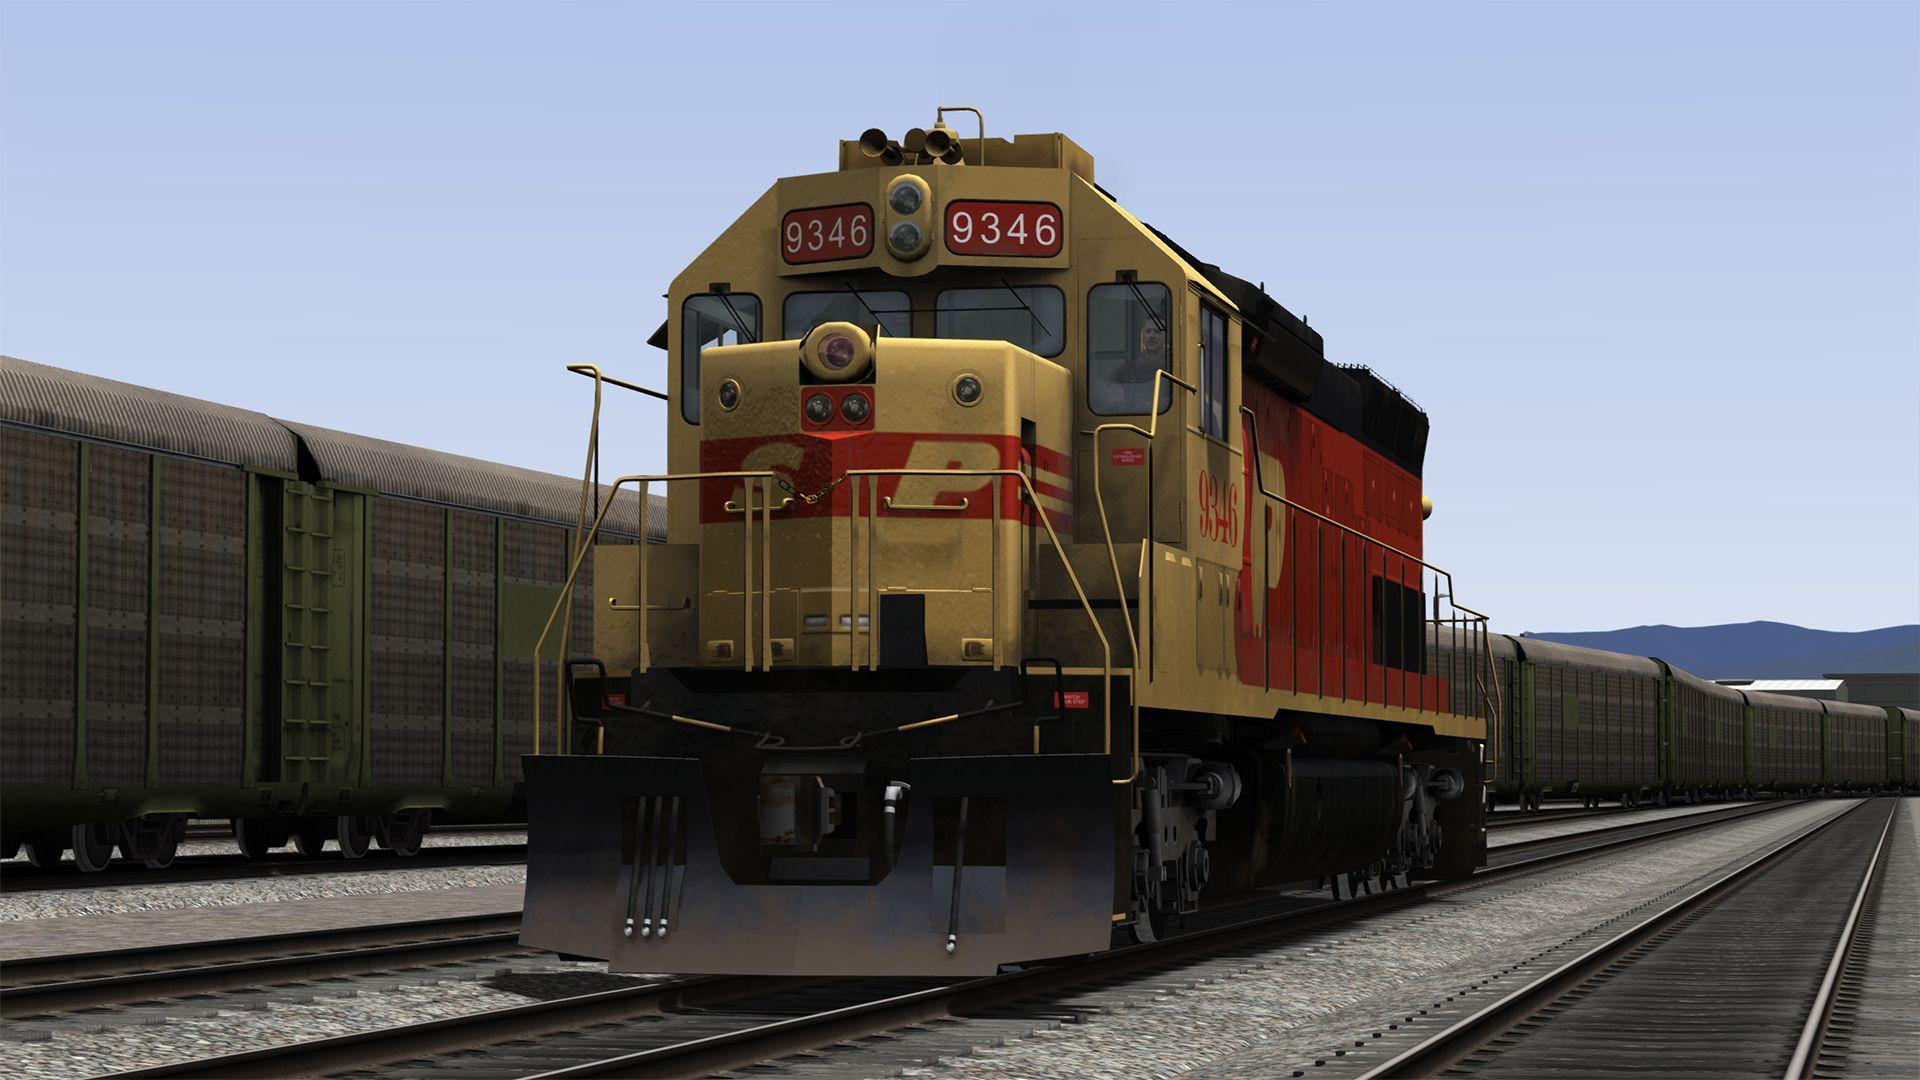 SPSD455